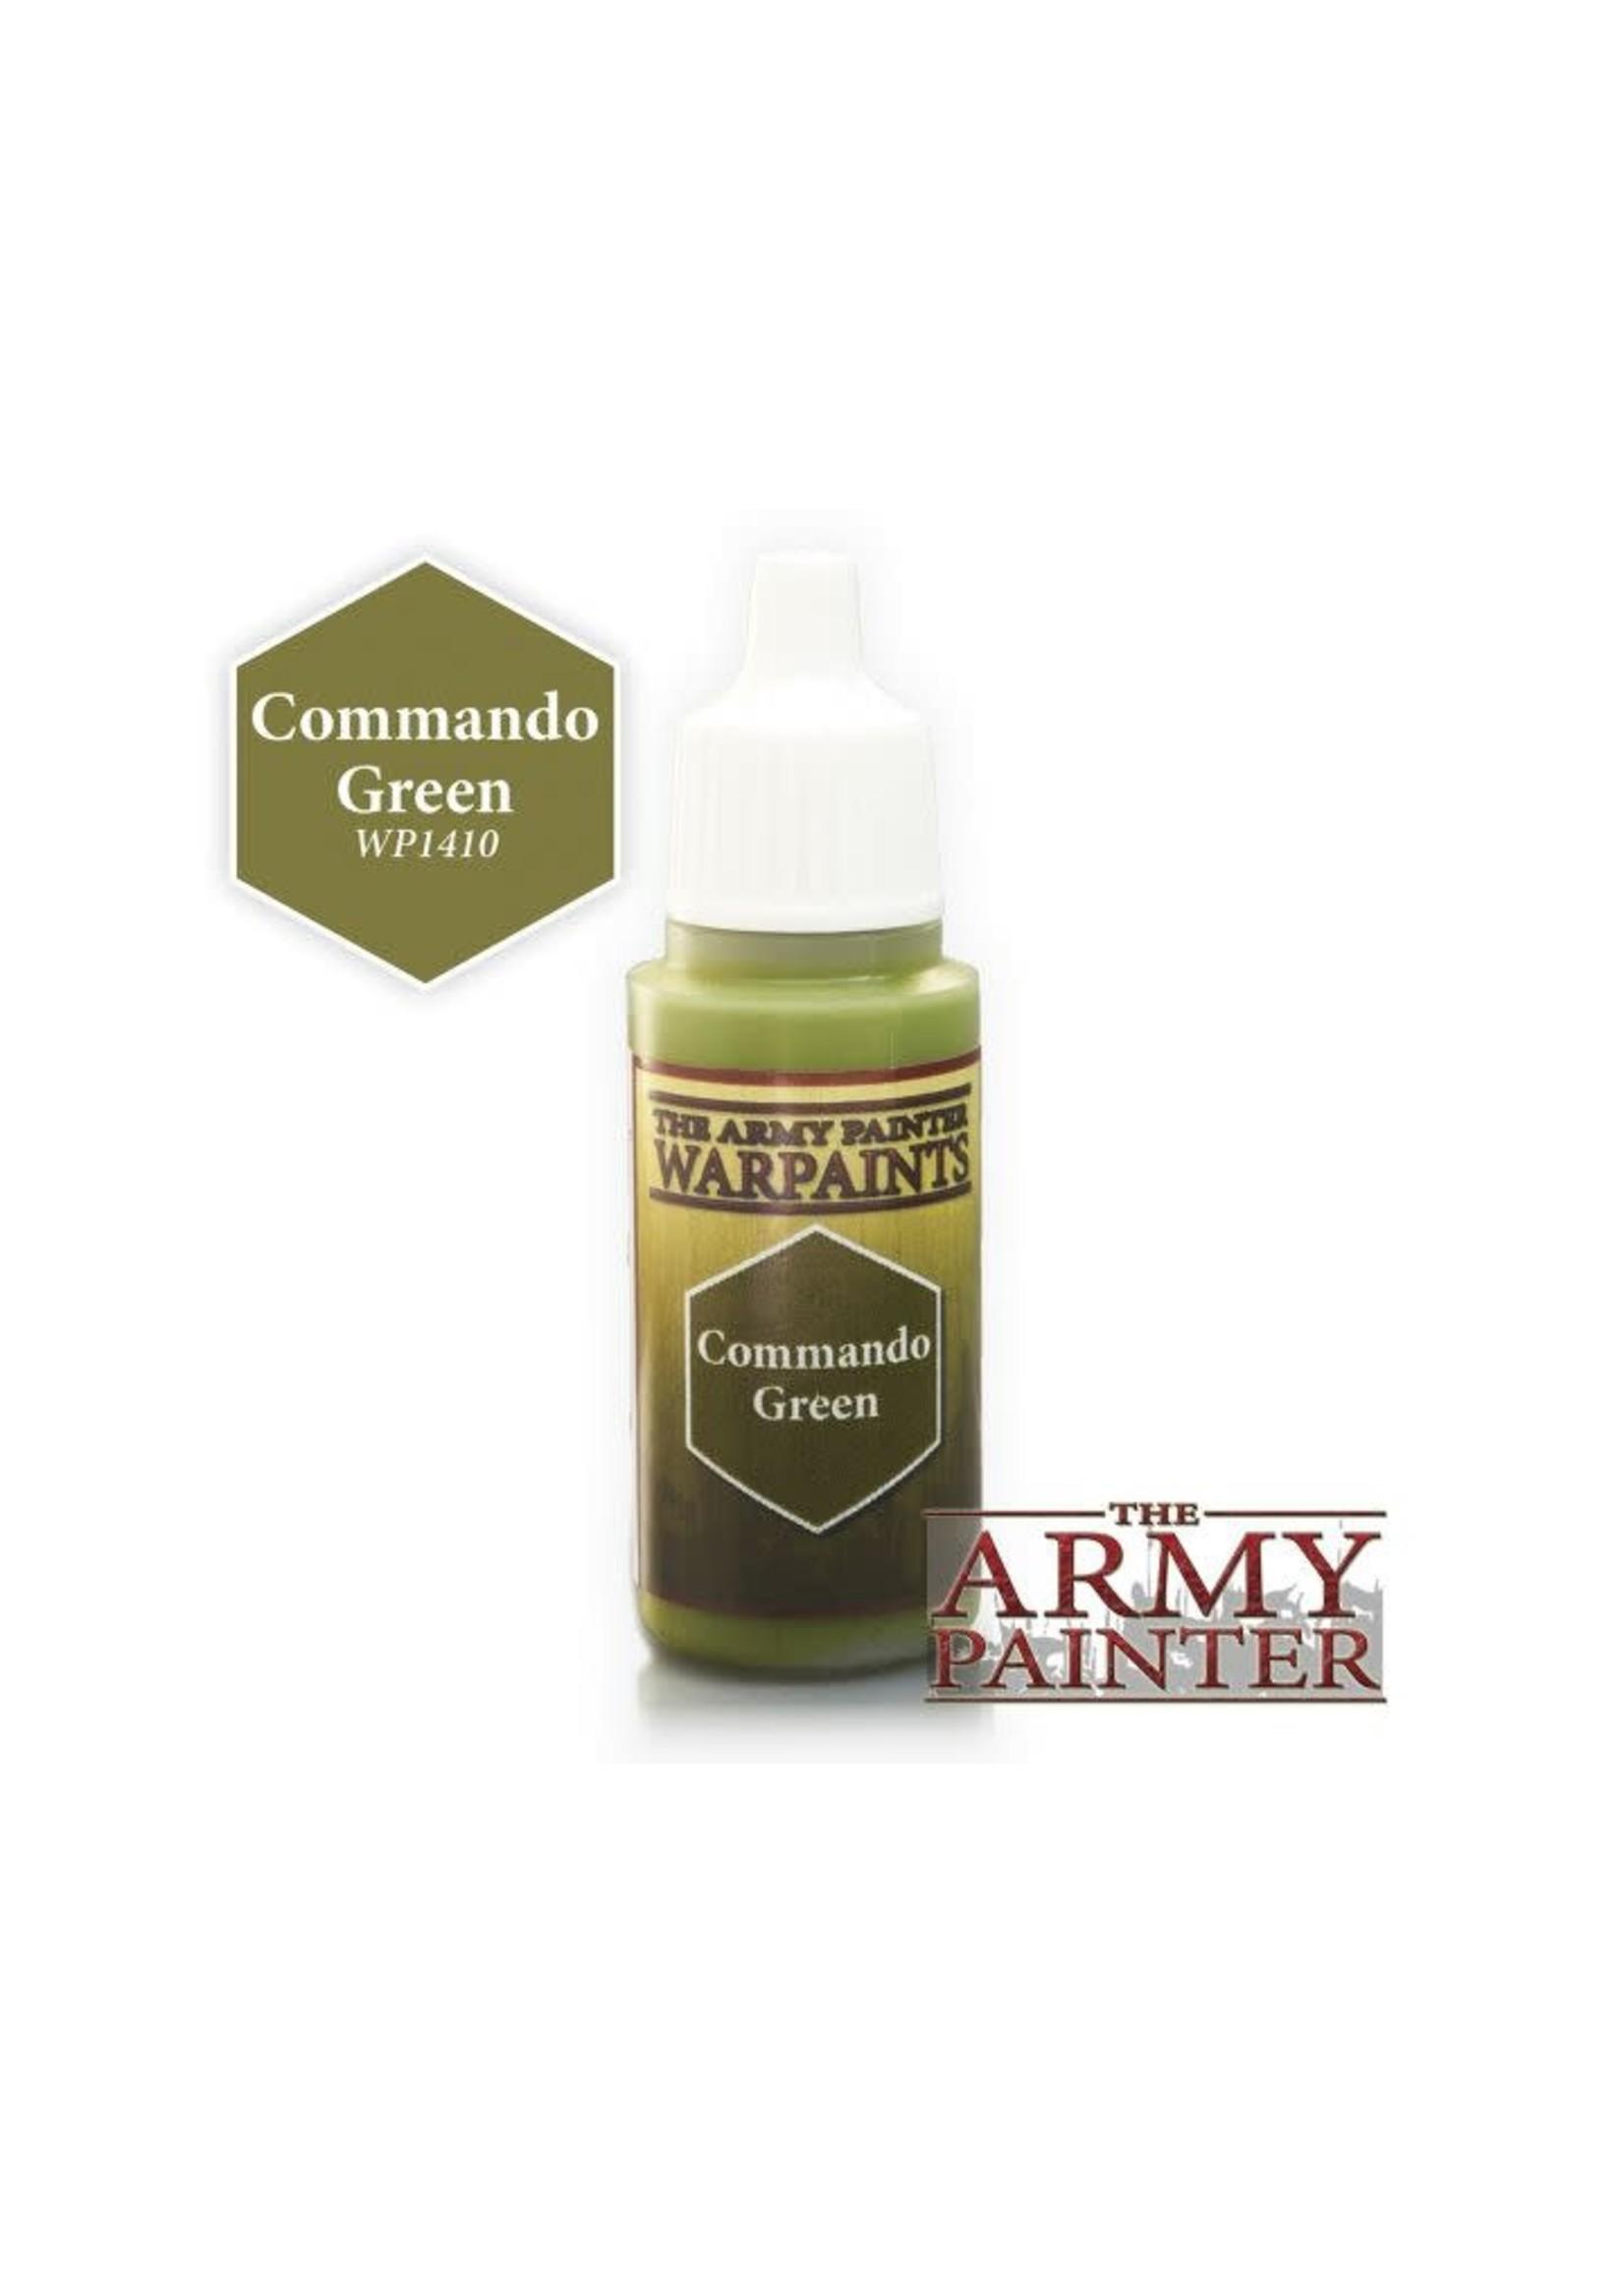 Army Painter Warpaints - Commando Green